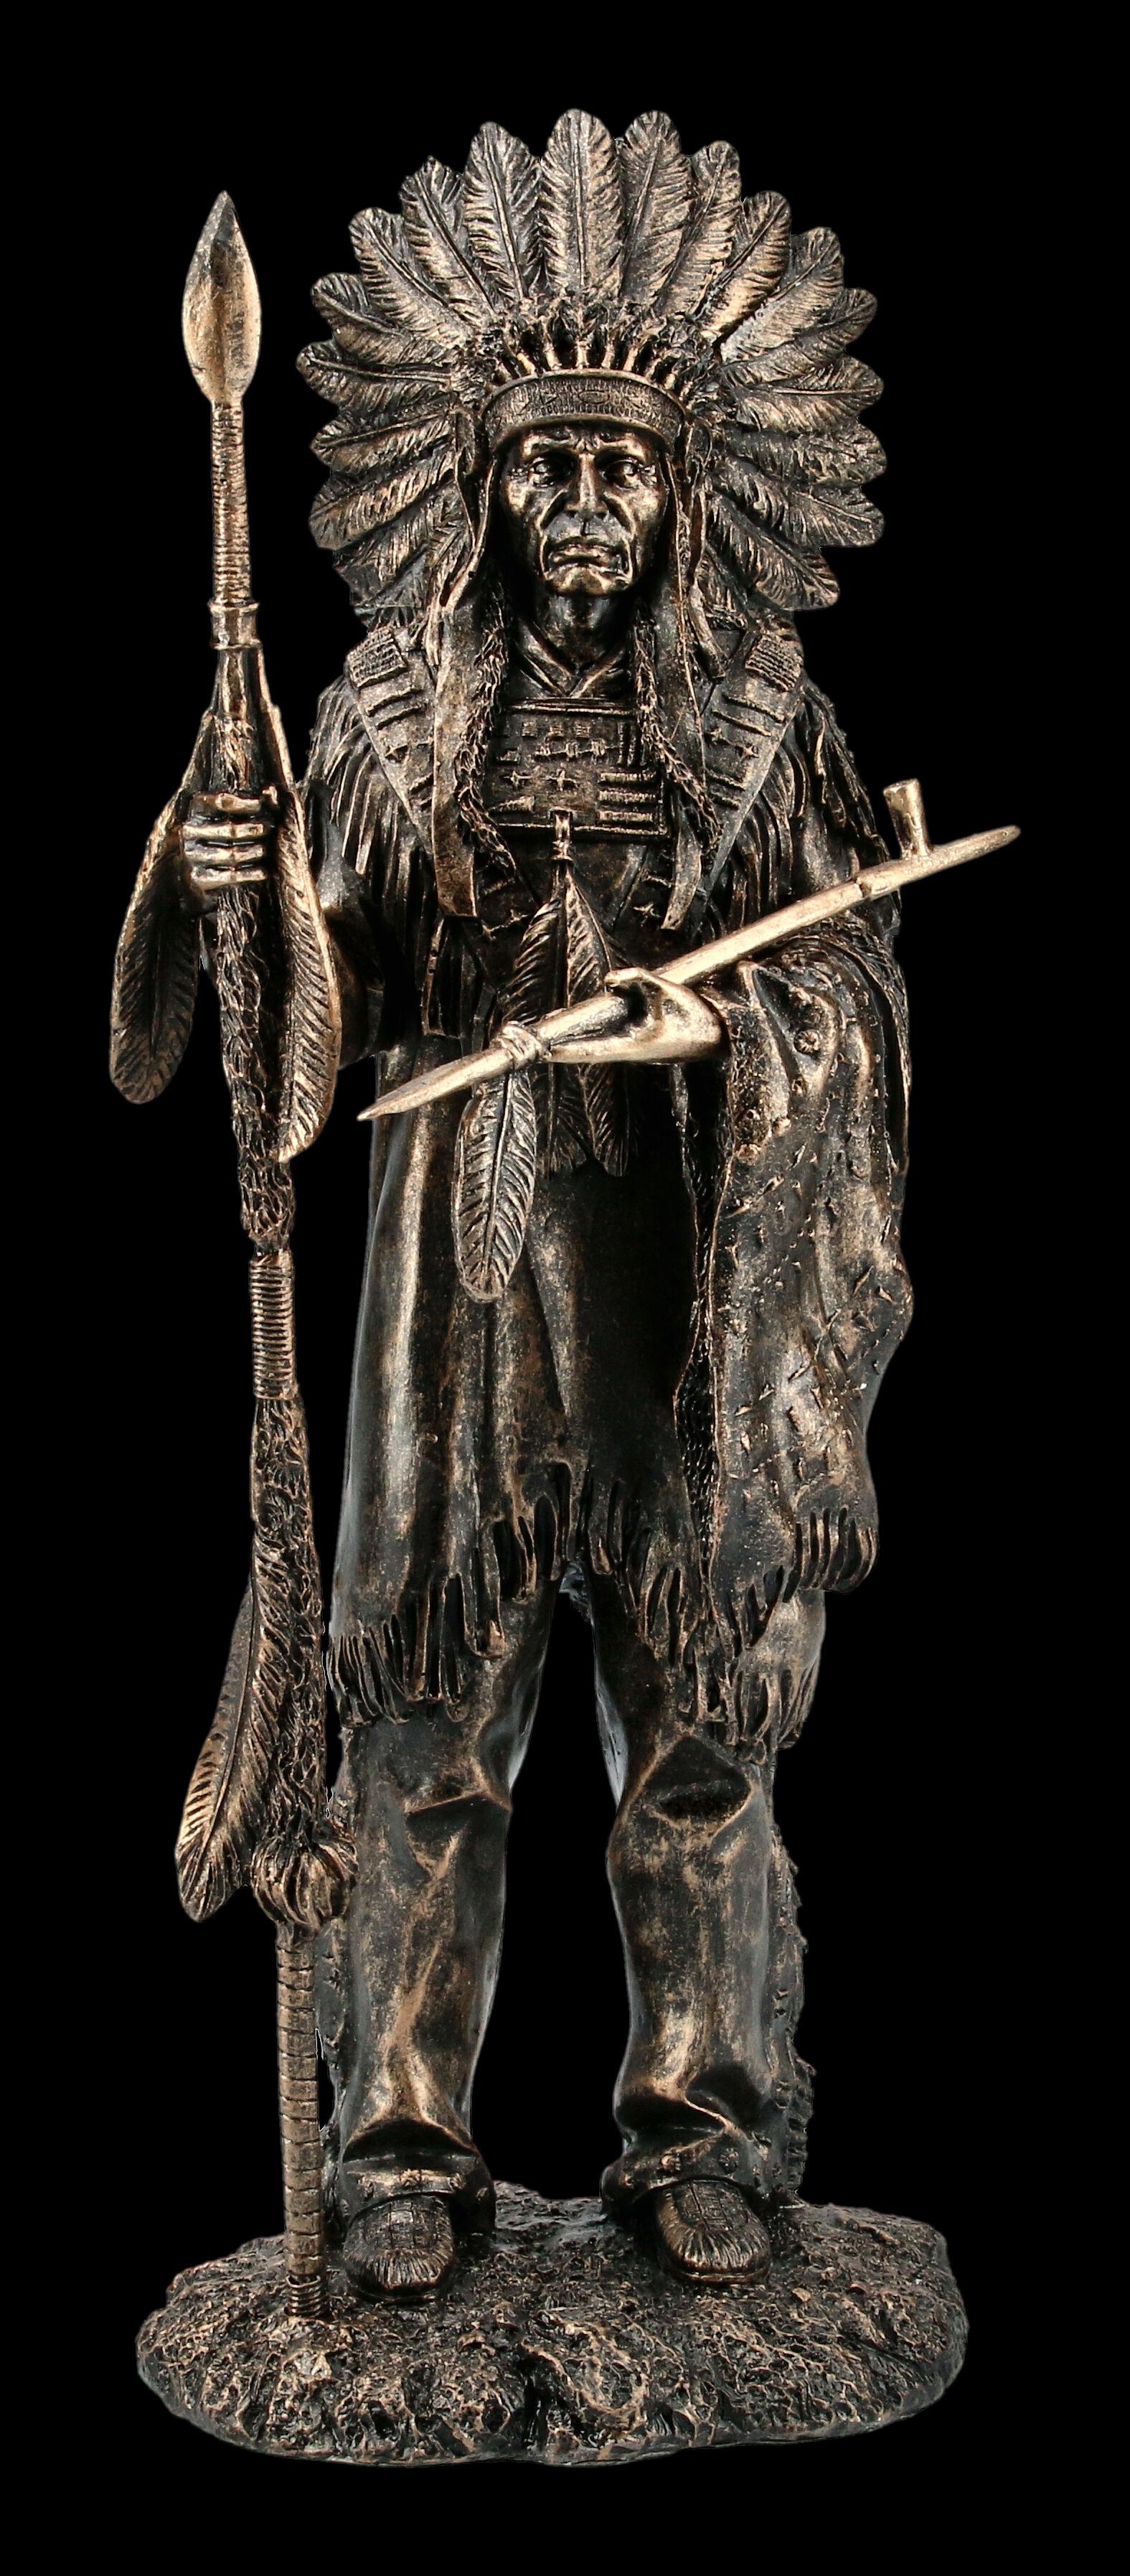 Figur Veronese Western Deko Indianer Büste Assiniboine